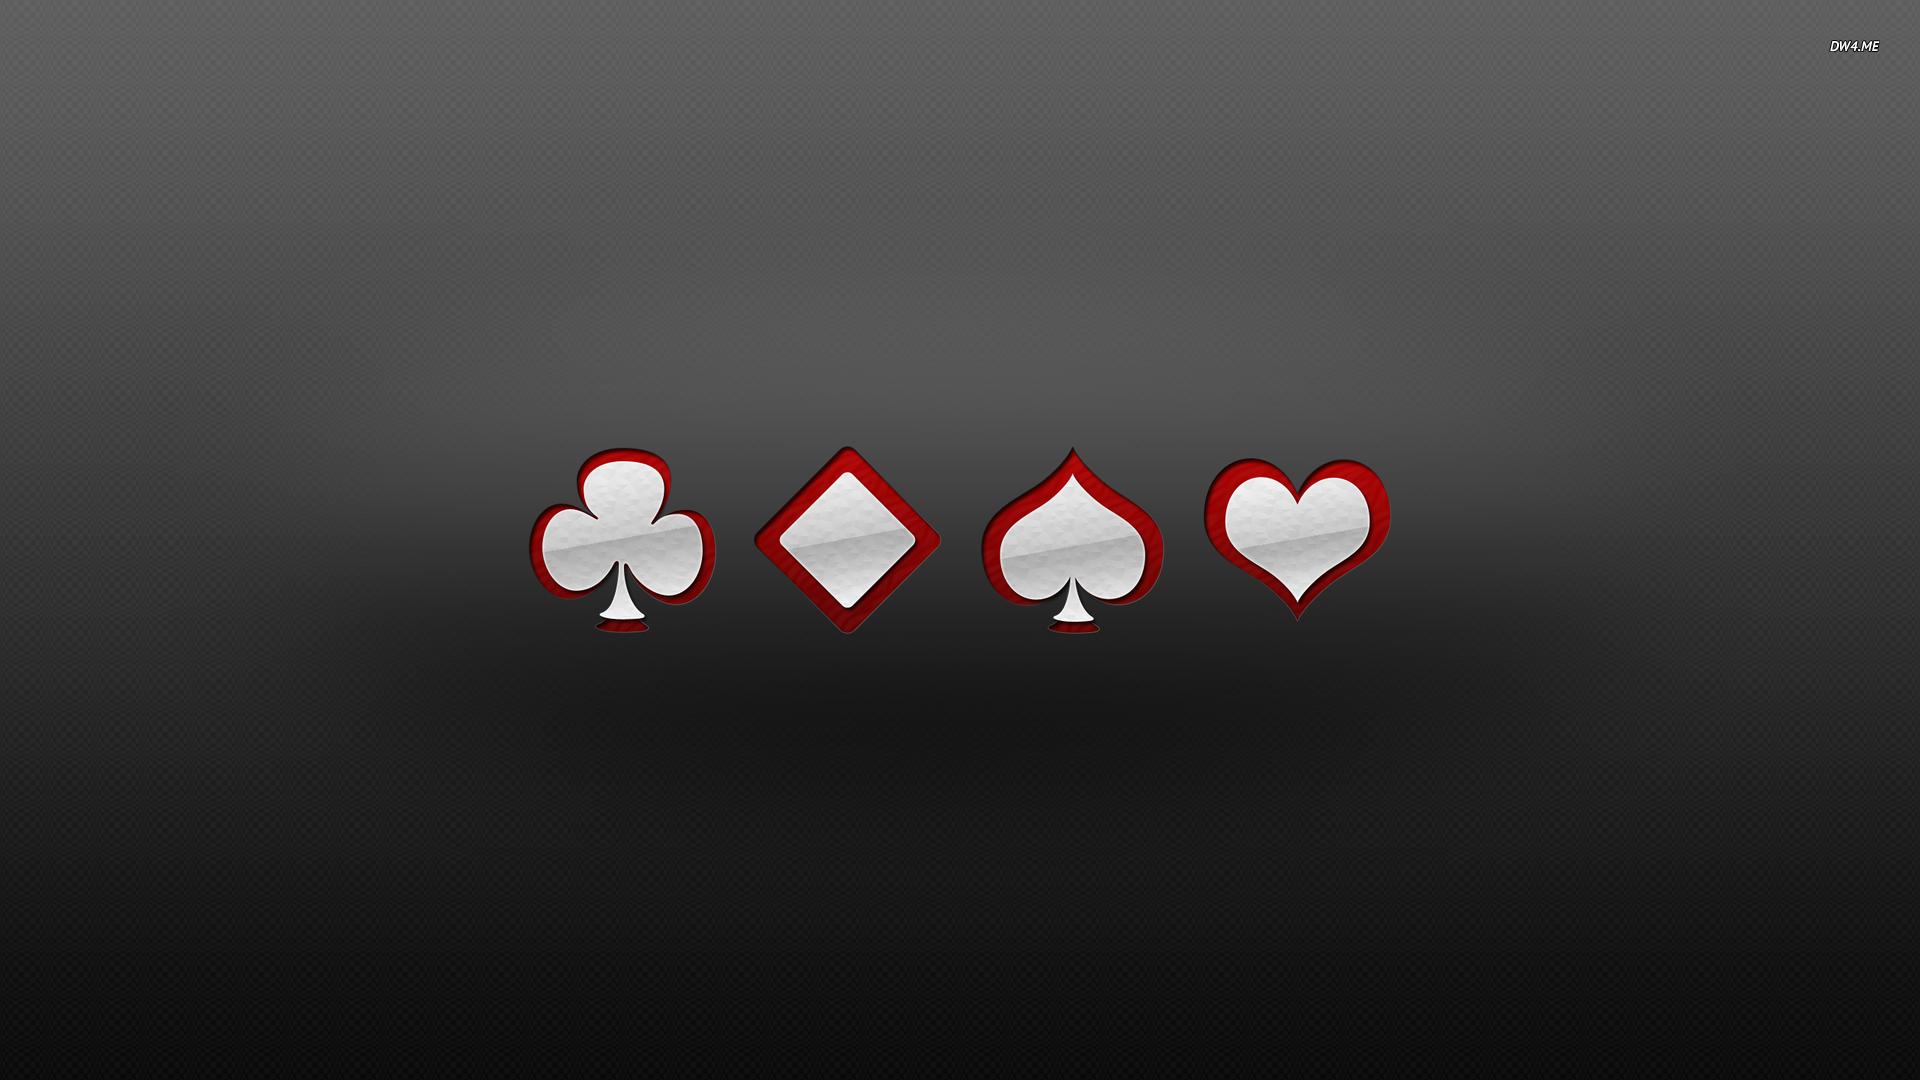 Burning Poker Joker Hd Desktop Wallpaper High Definition Poker Cards Cards Cool Playing Cards